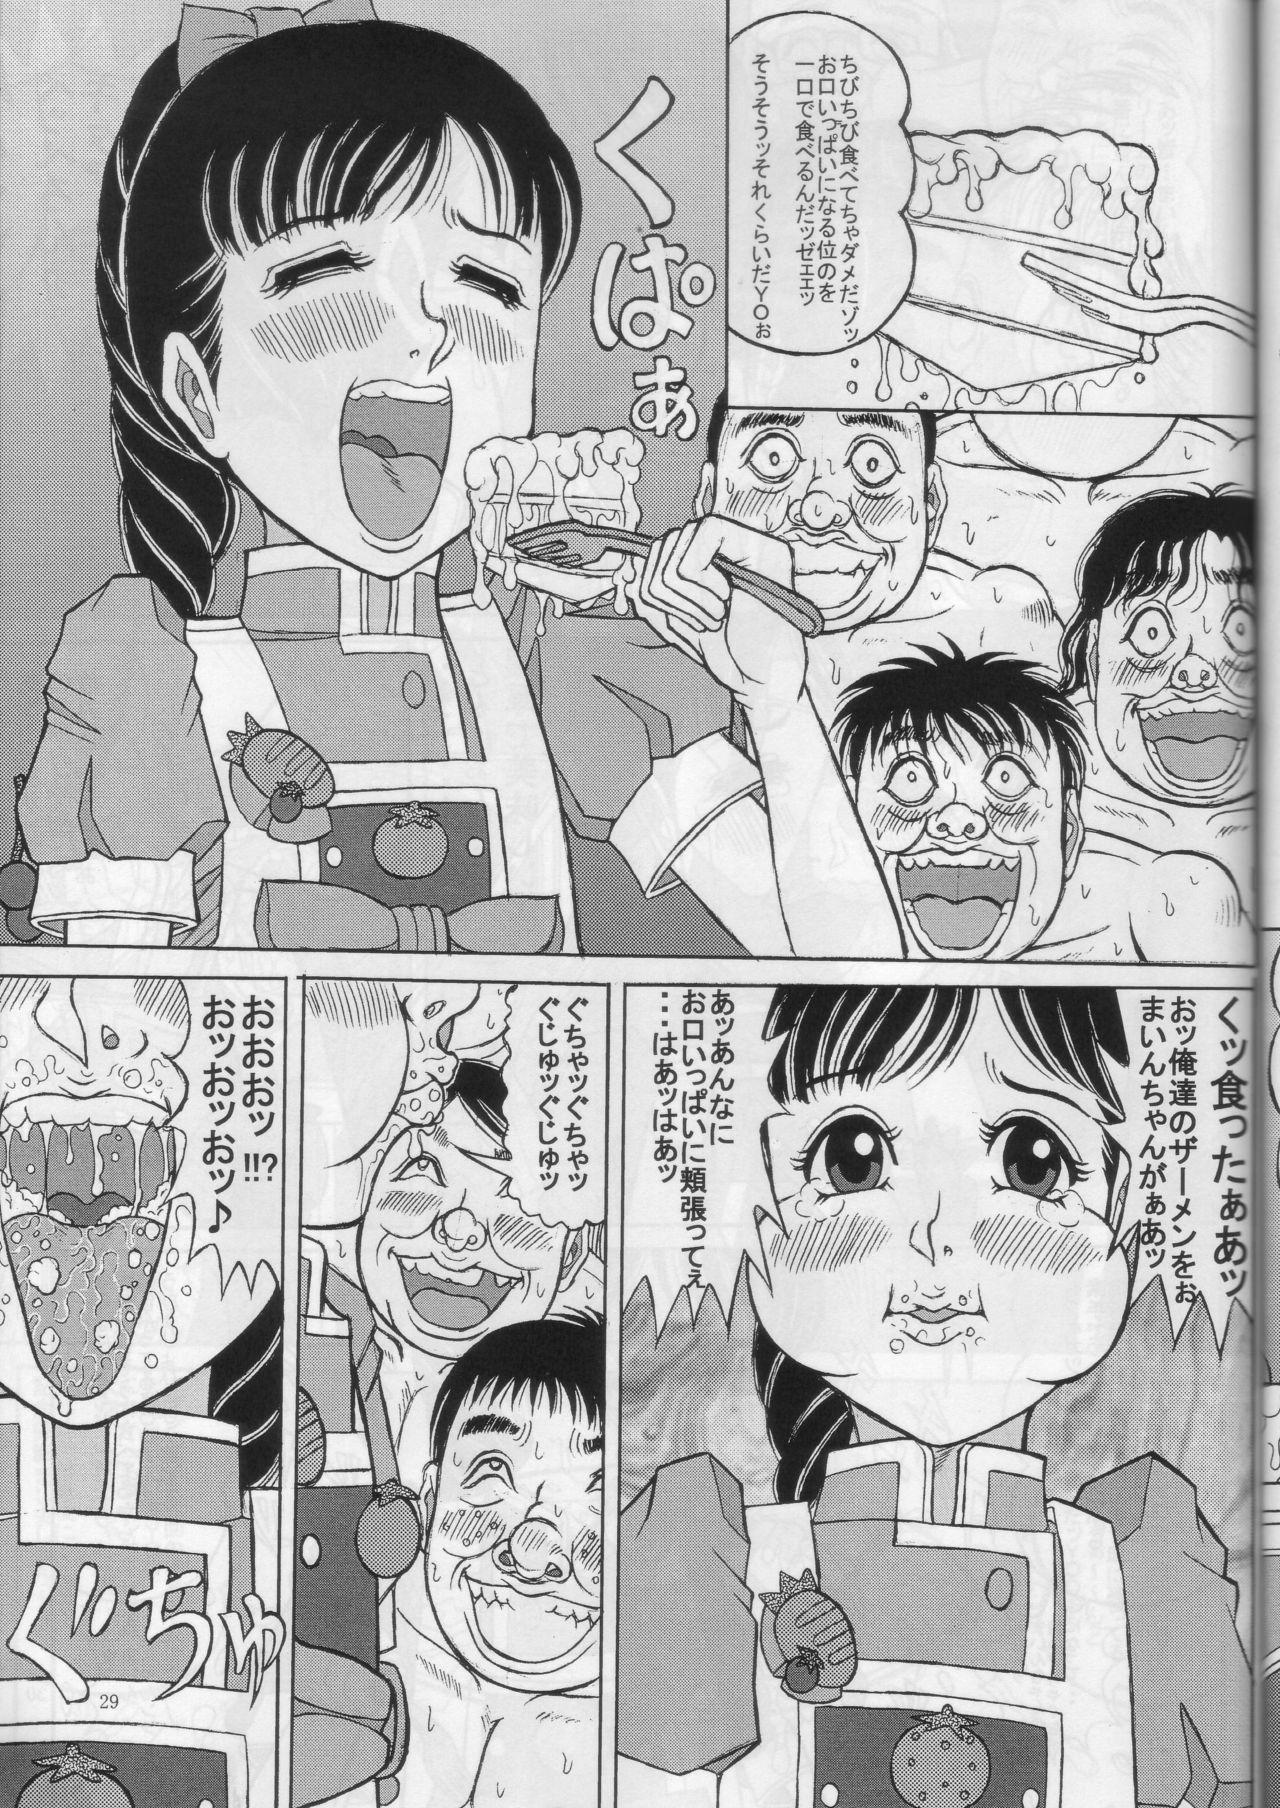 Minna de Yokumite Ara★Domo♪ Kaiseiban 27